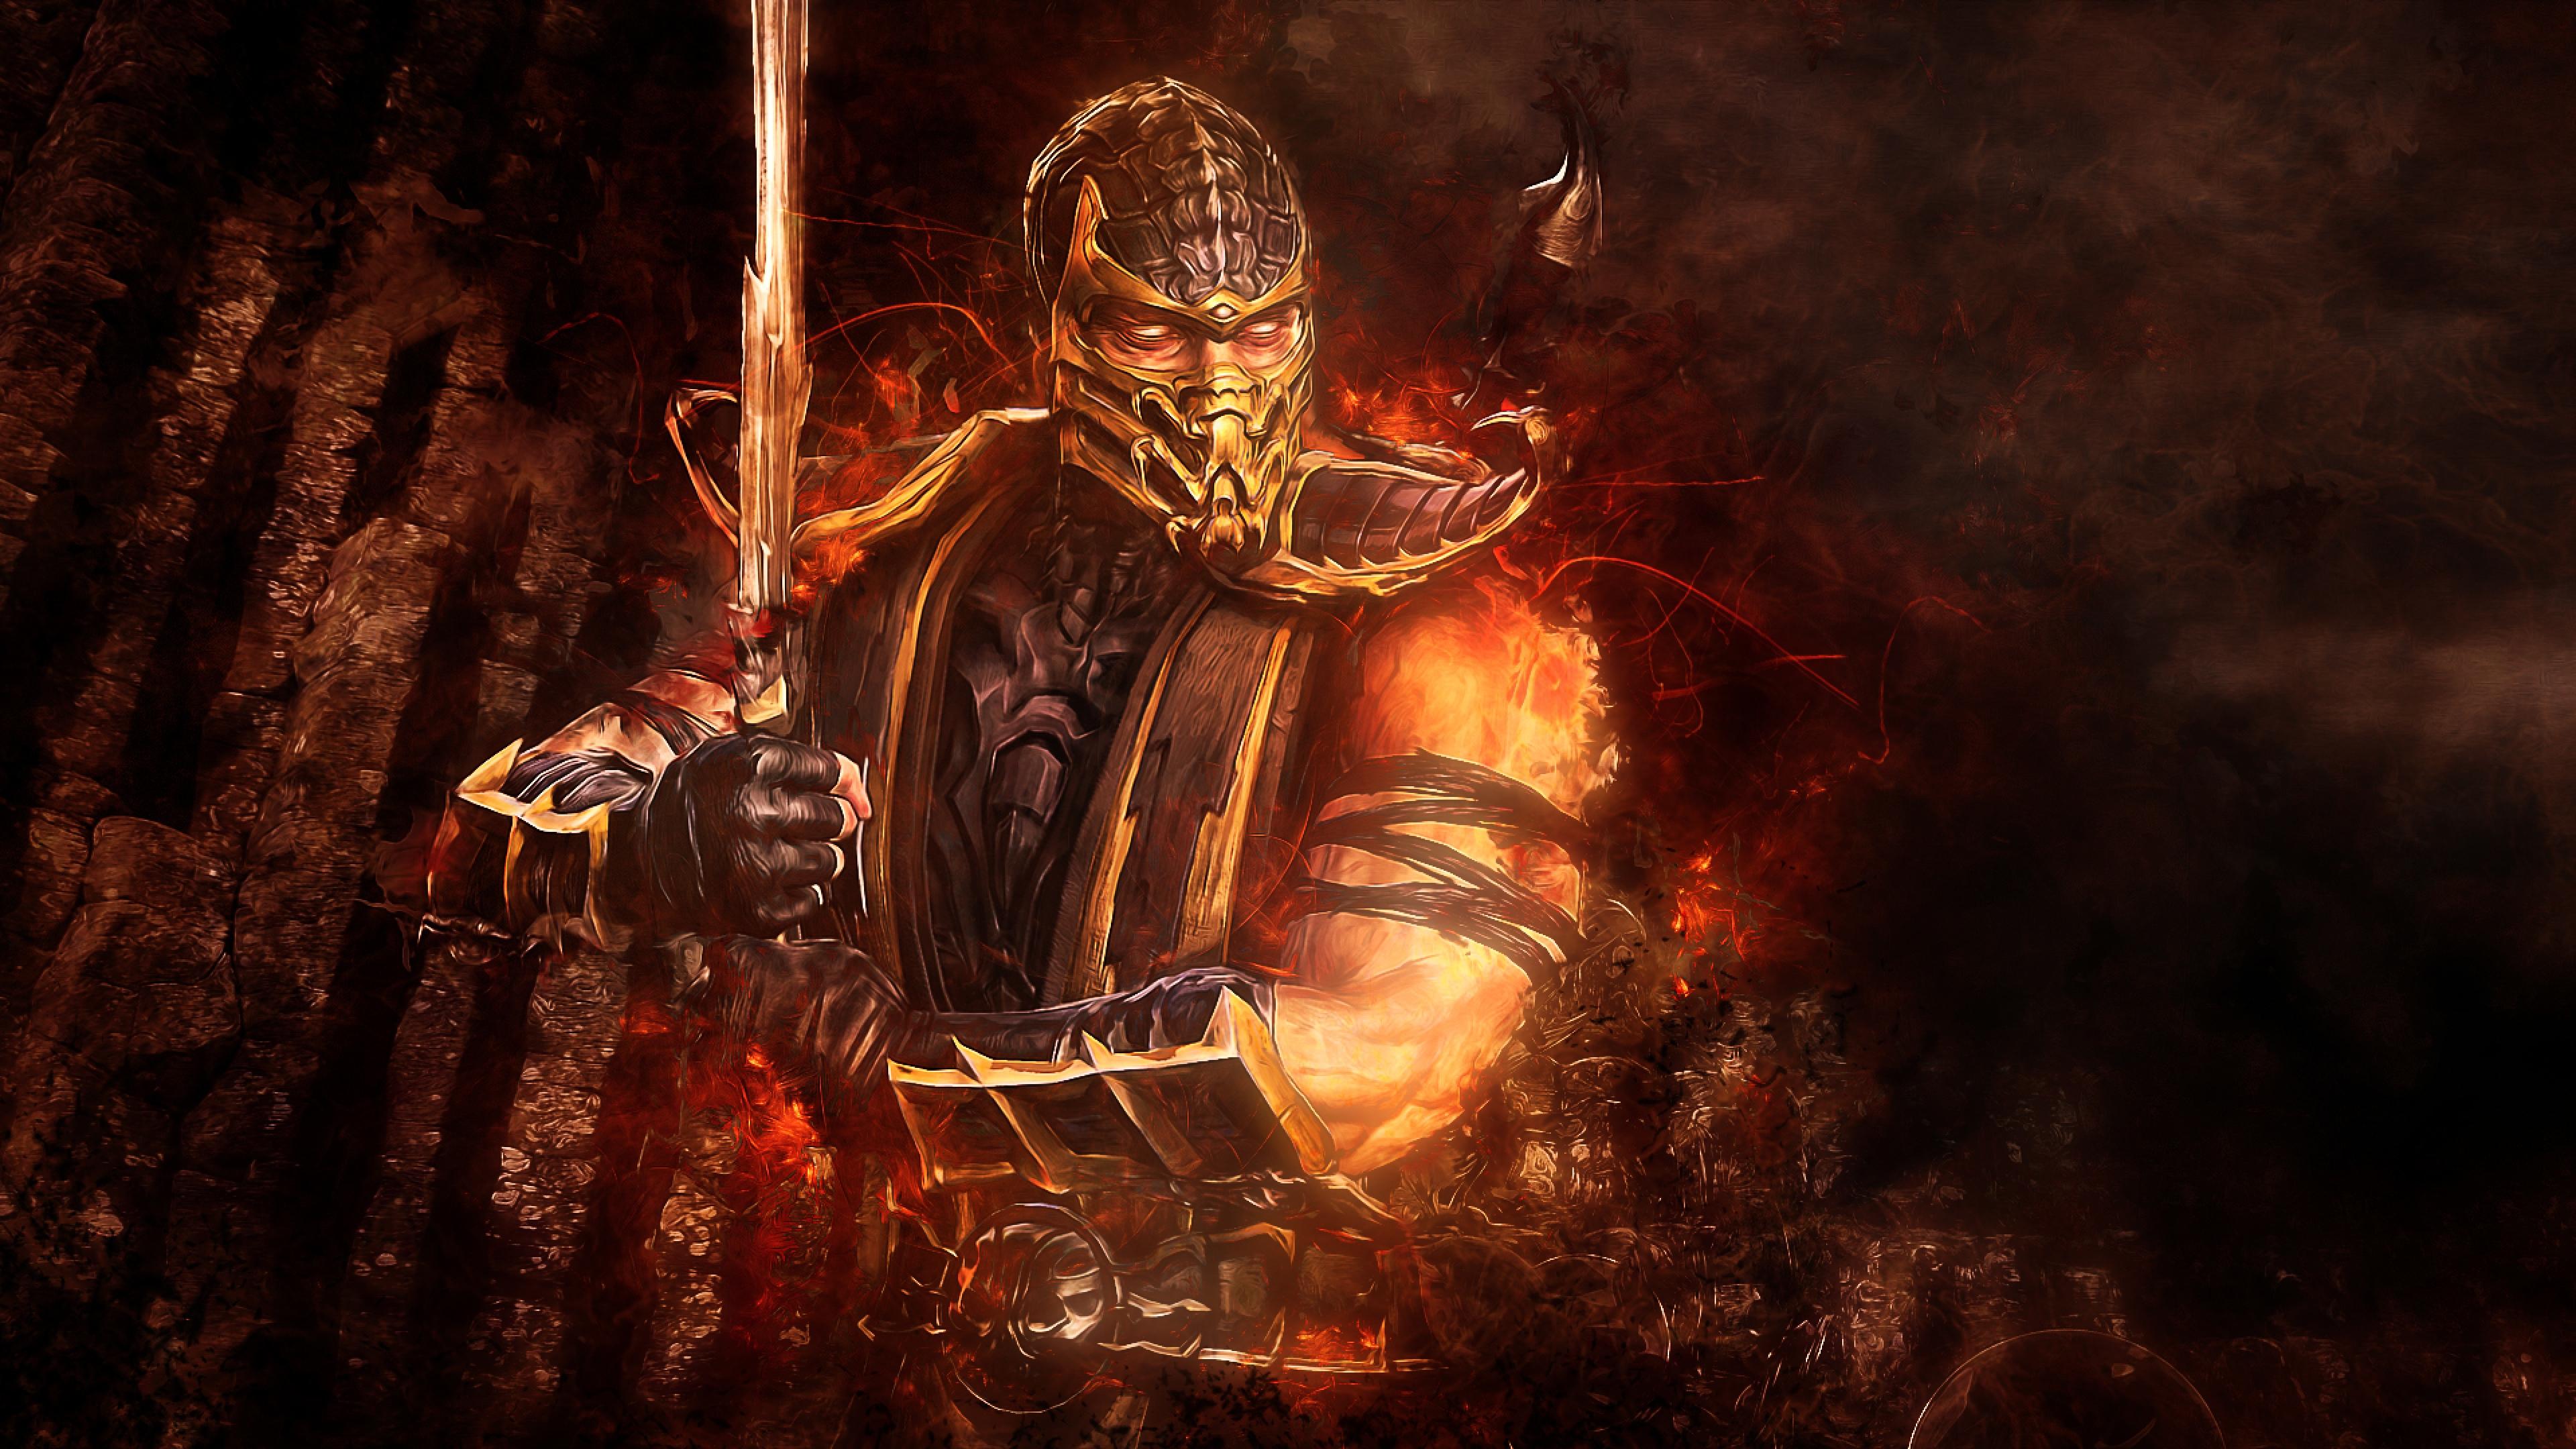 Mortal Kombat Scorpion 2048x1152 Resolution